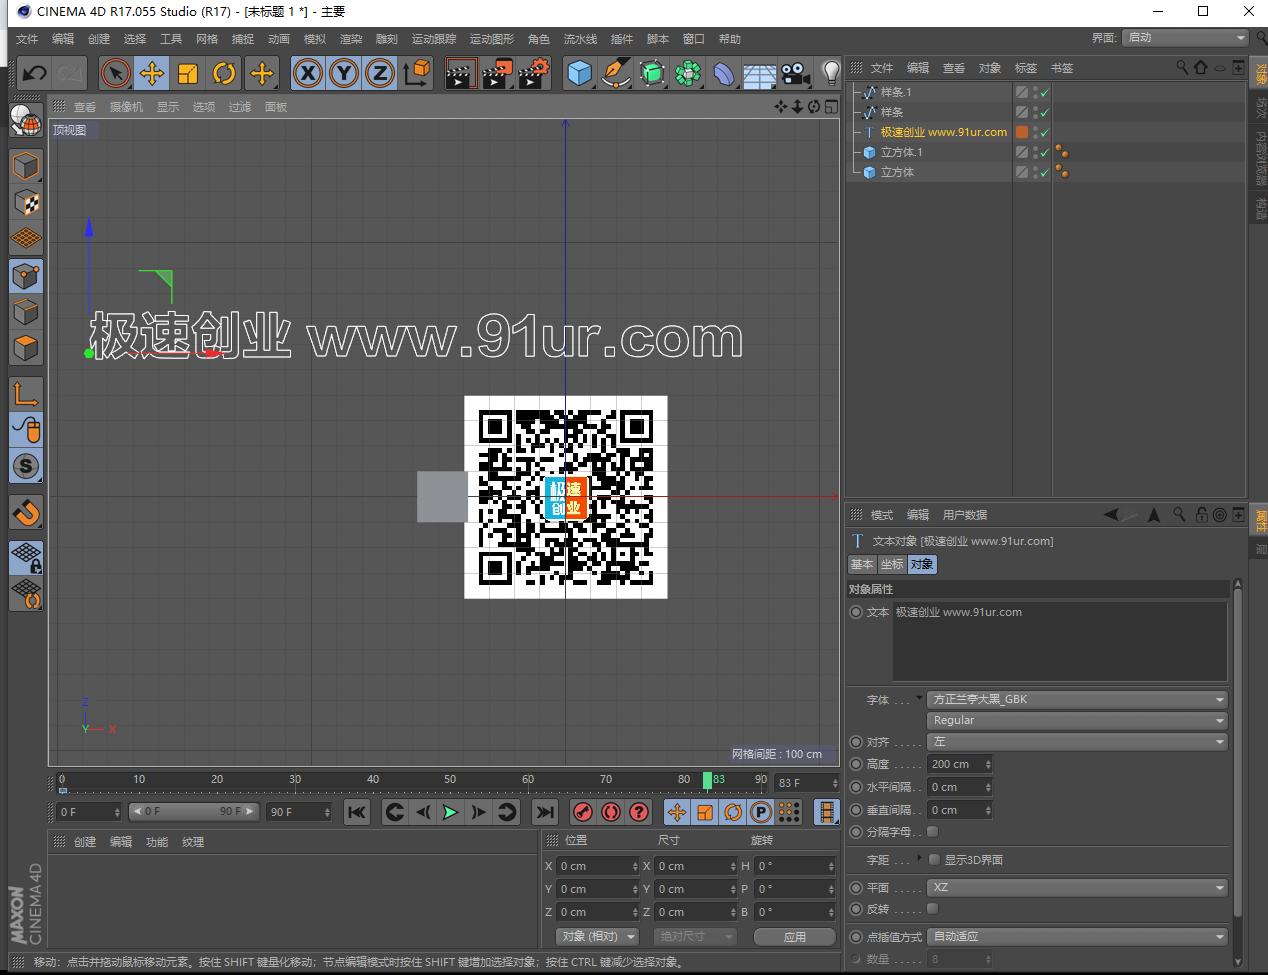 c4d视频软件-R17_Installation+C4D R17注册机#Ciname 4D R17中文版免费下载